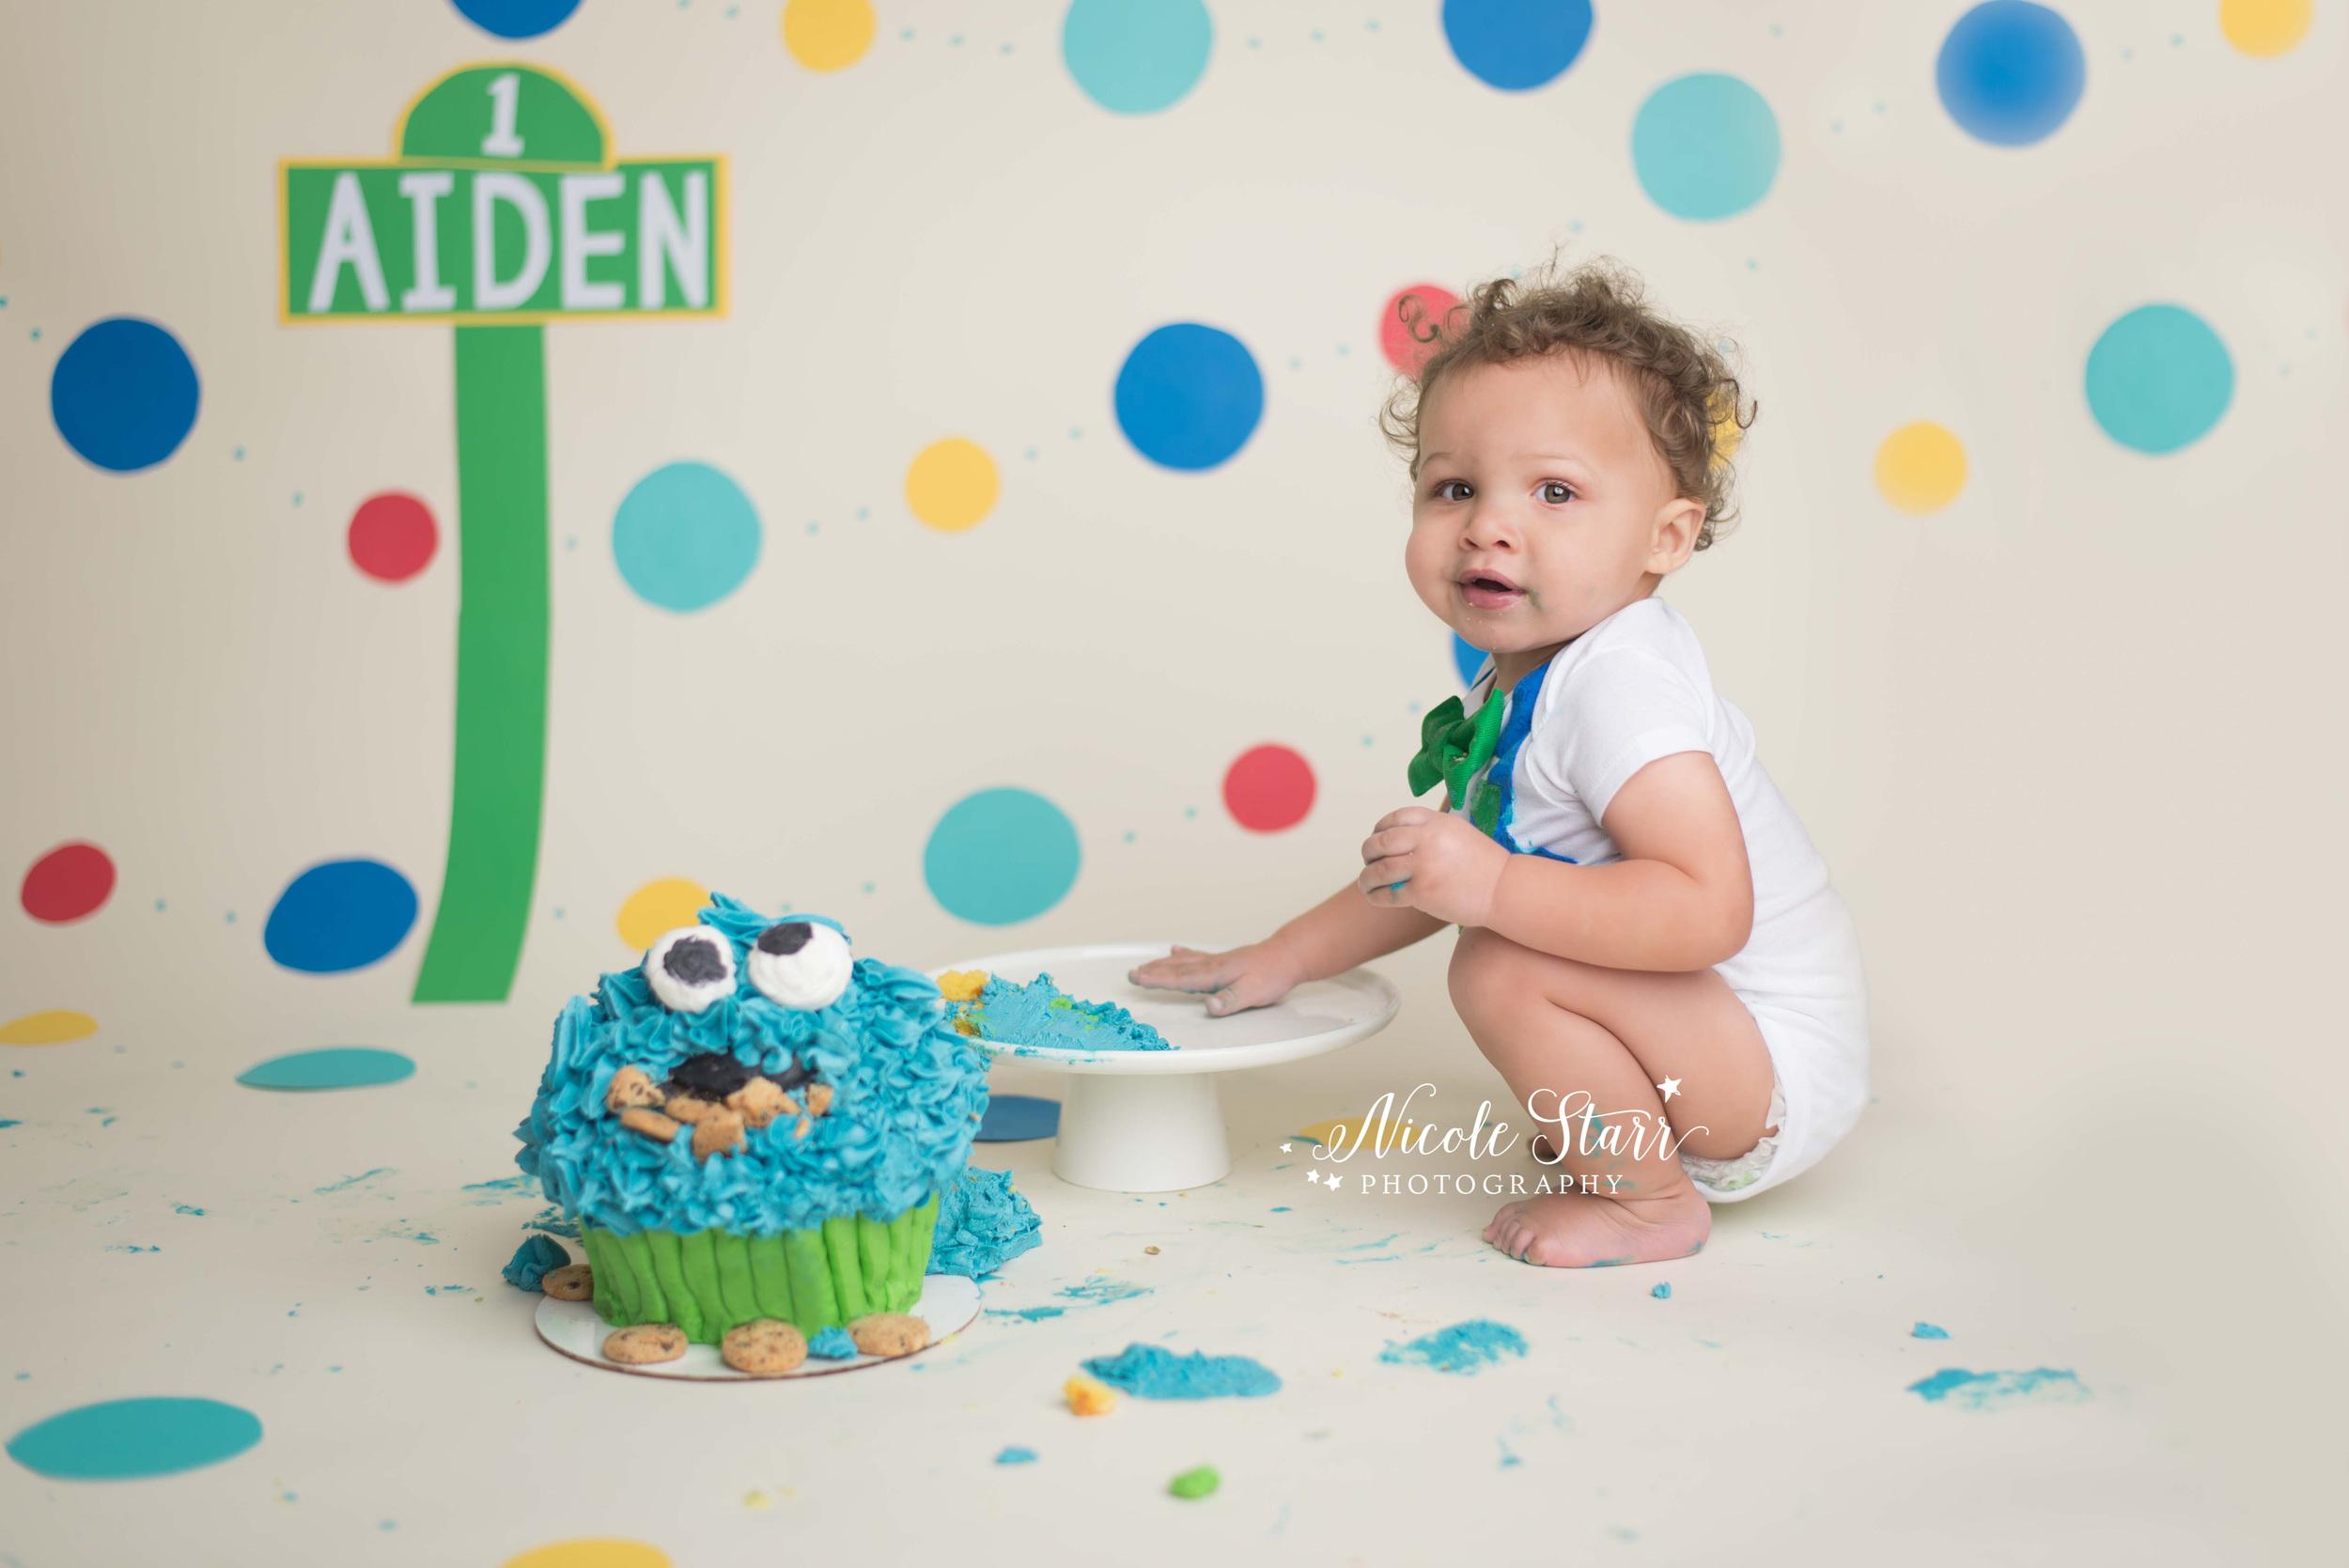 upstate new york baby birthday photographer sesame street cookie monster cake smash.jpg